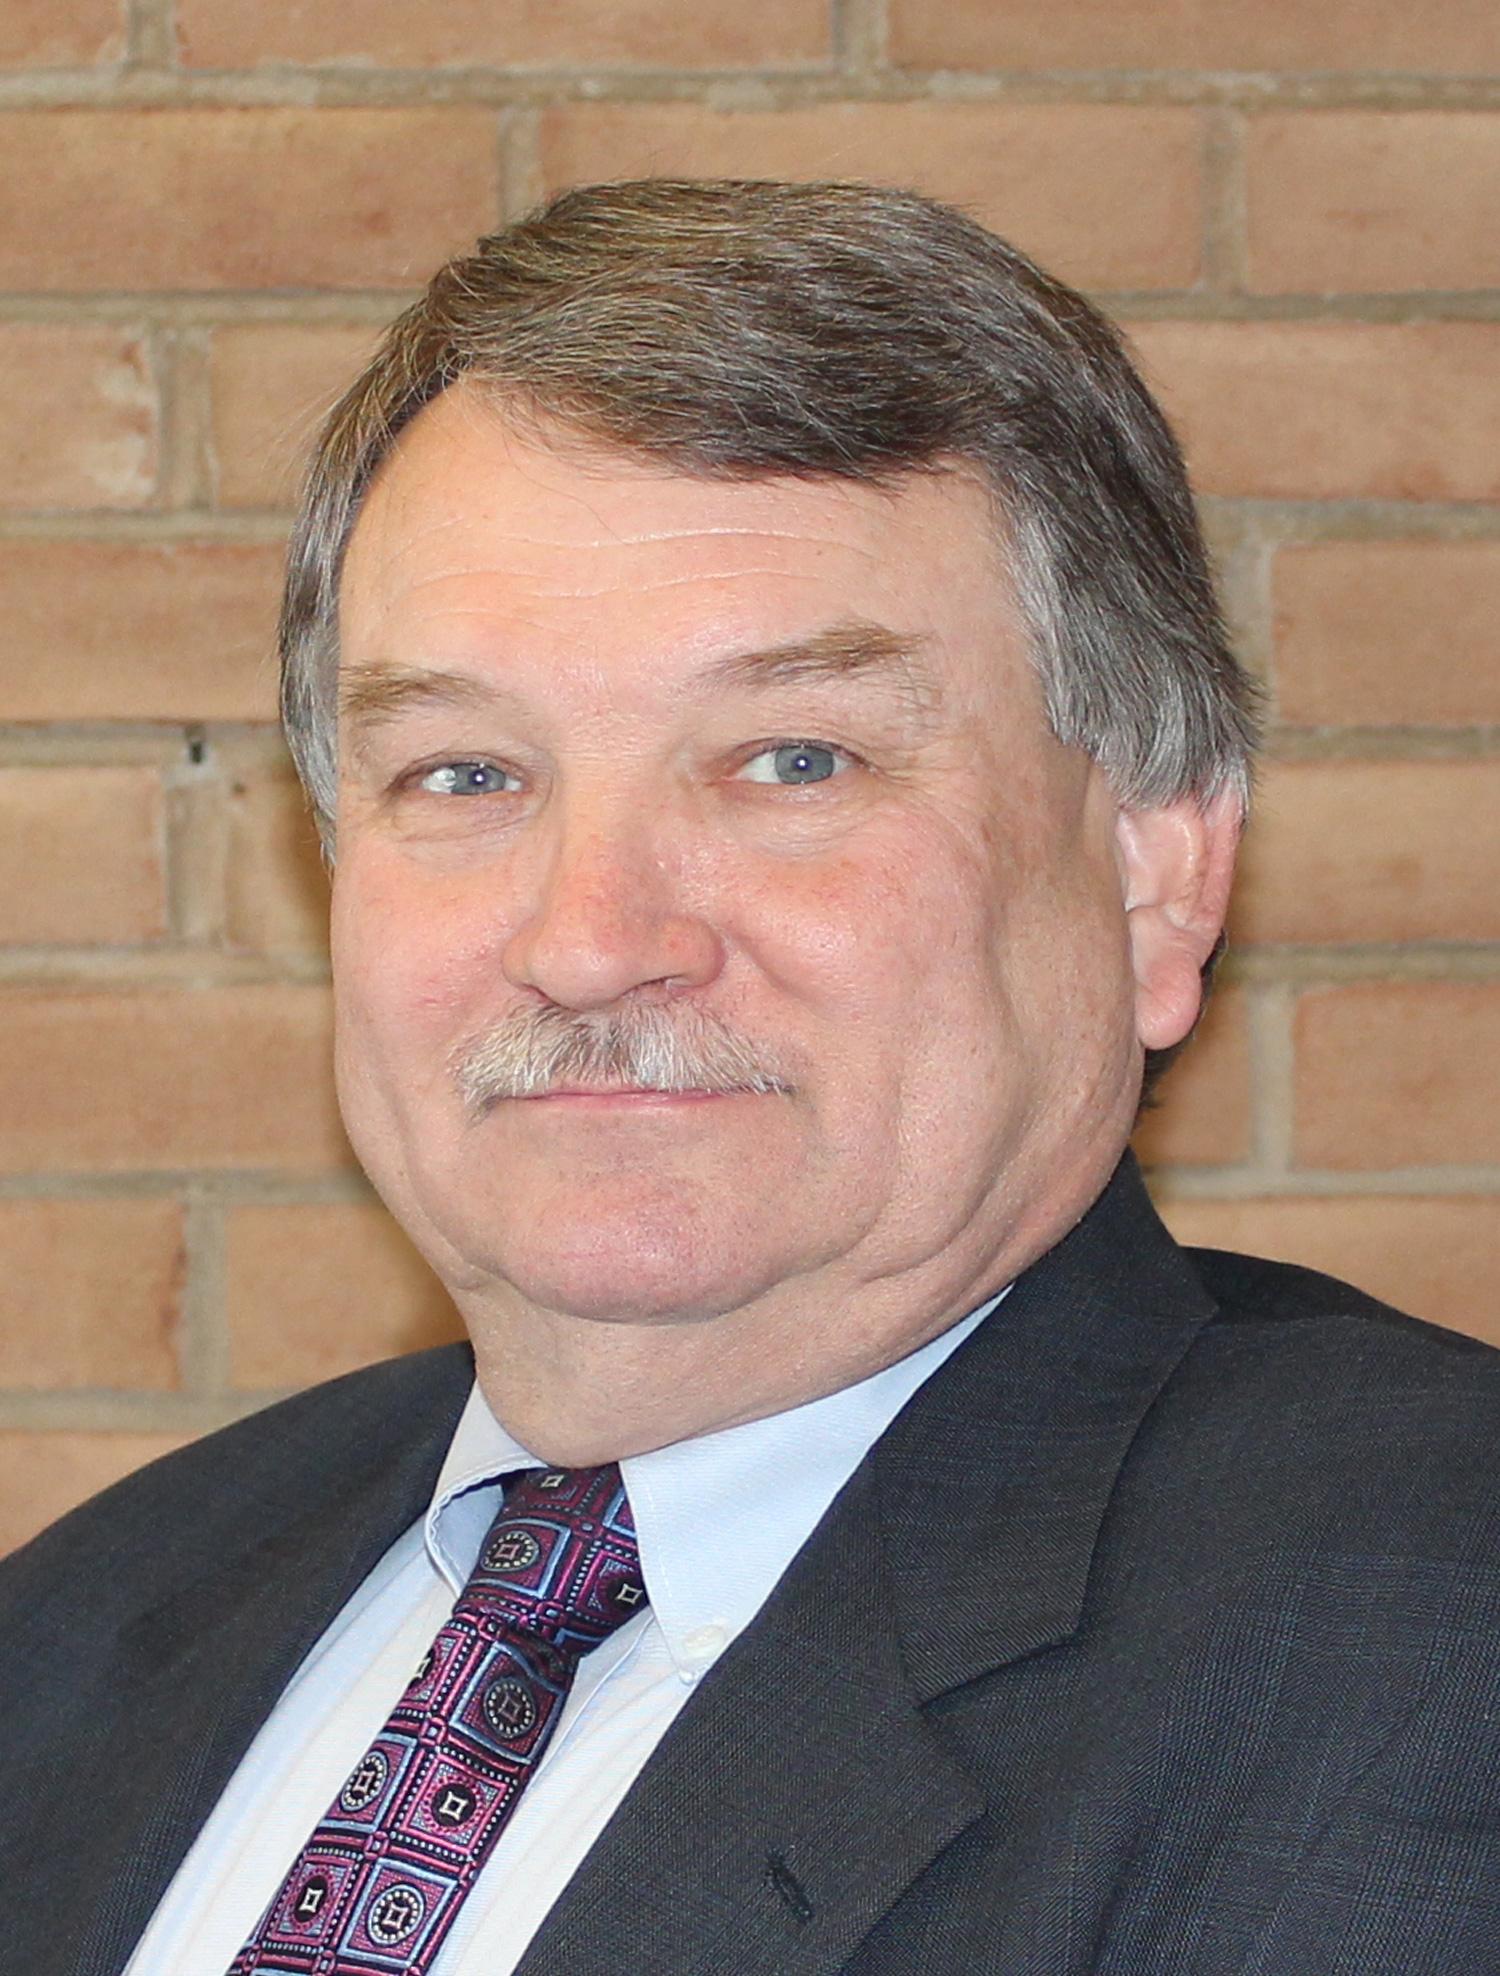 Greg Mckenzie, AIA, Senior Architect